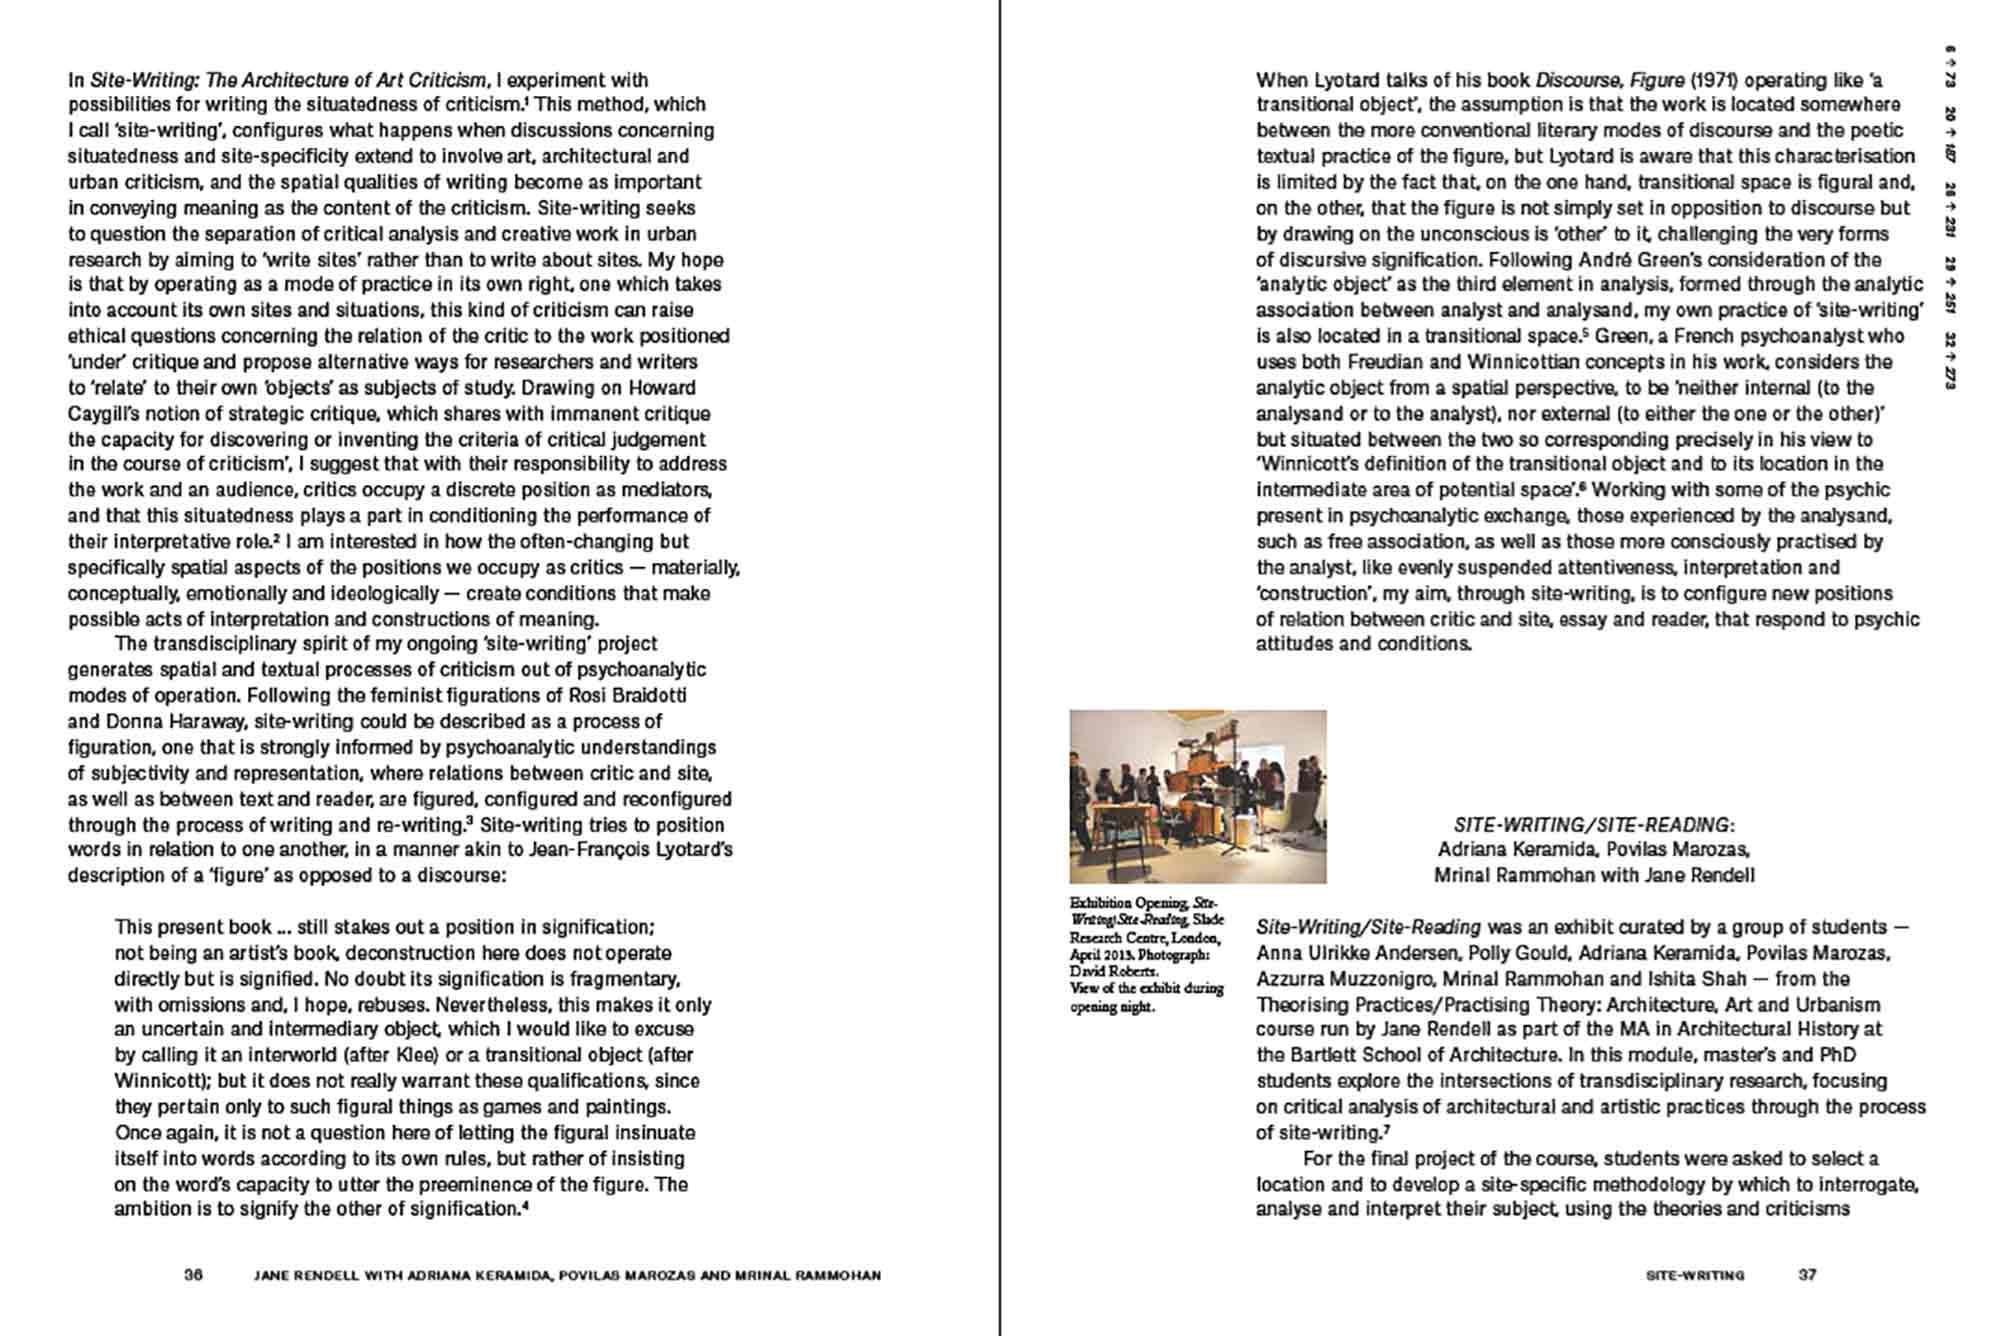 Site-Writing/Site Reading, Engaged Urbanism (36-37)